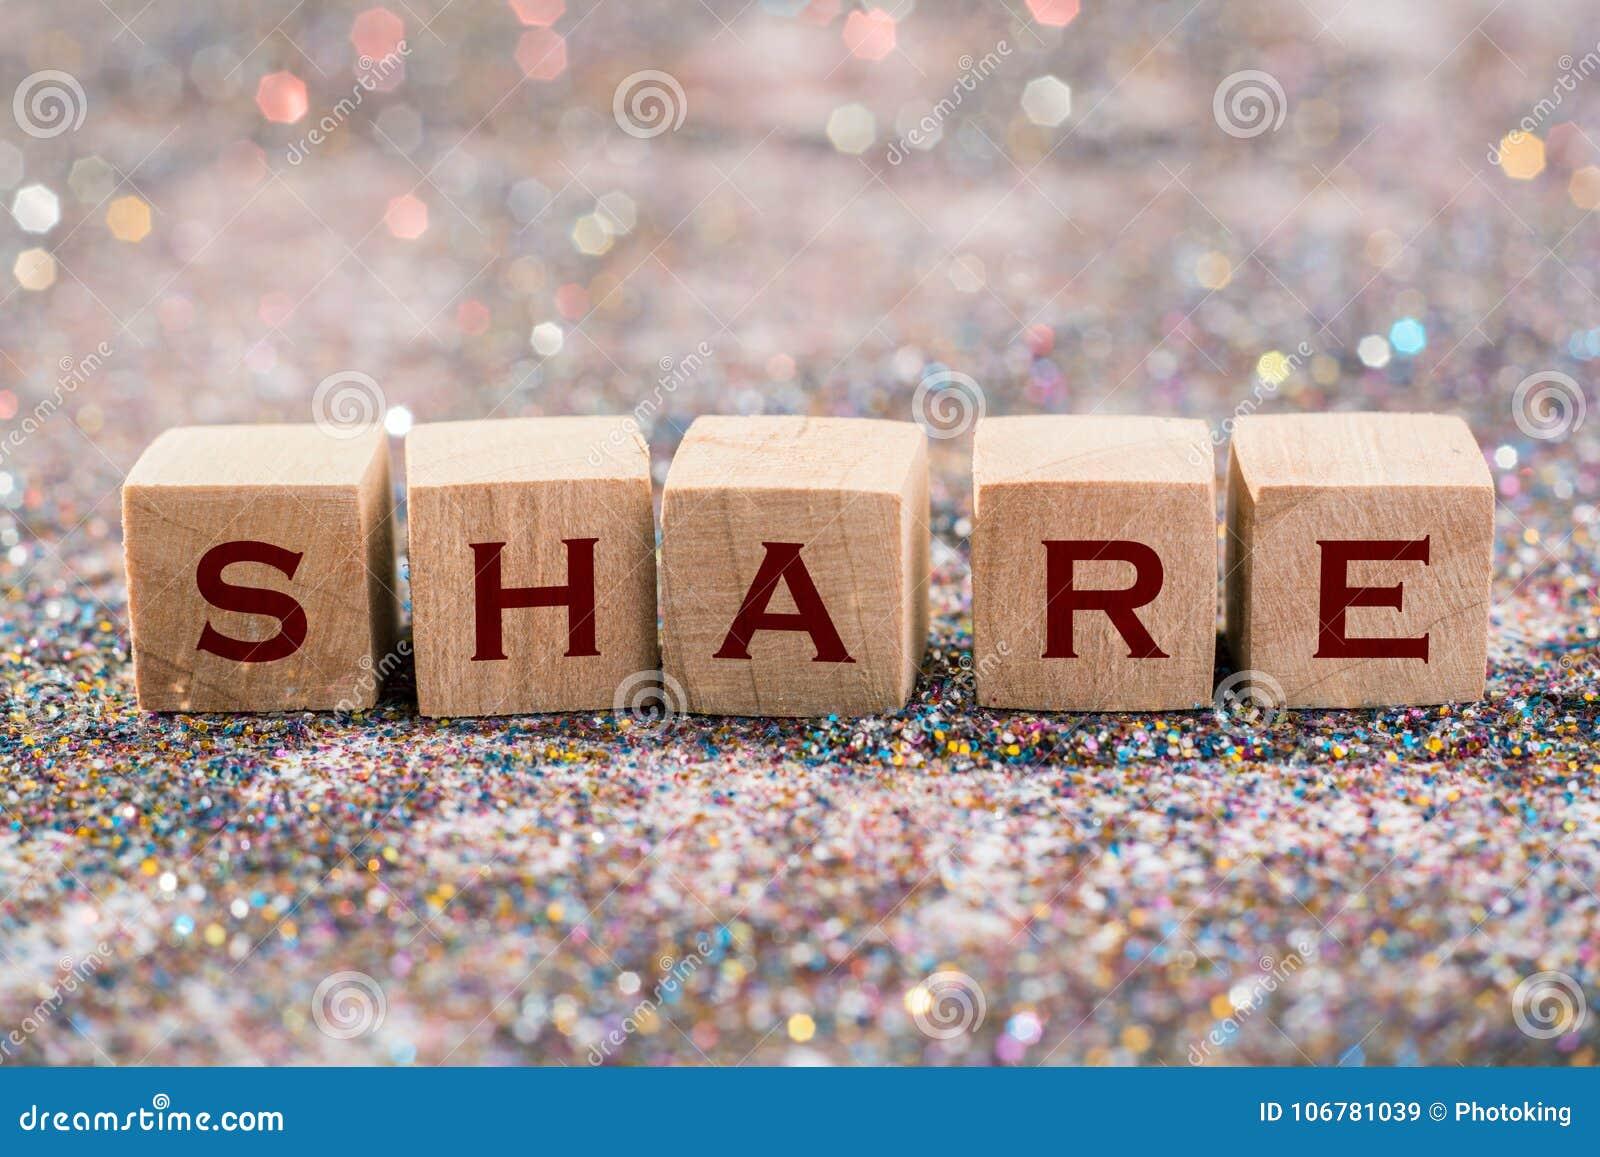 Share word